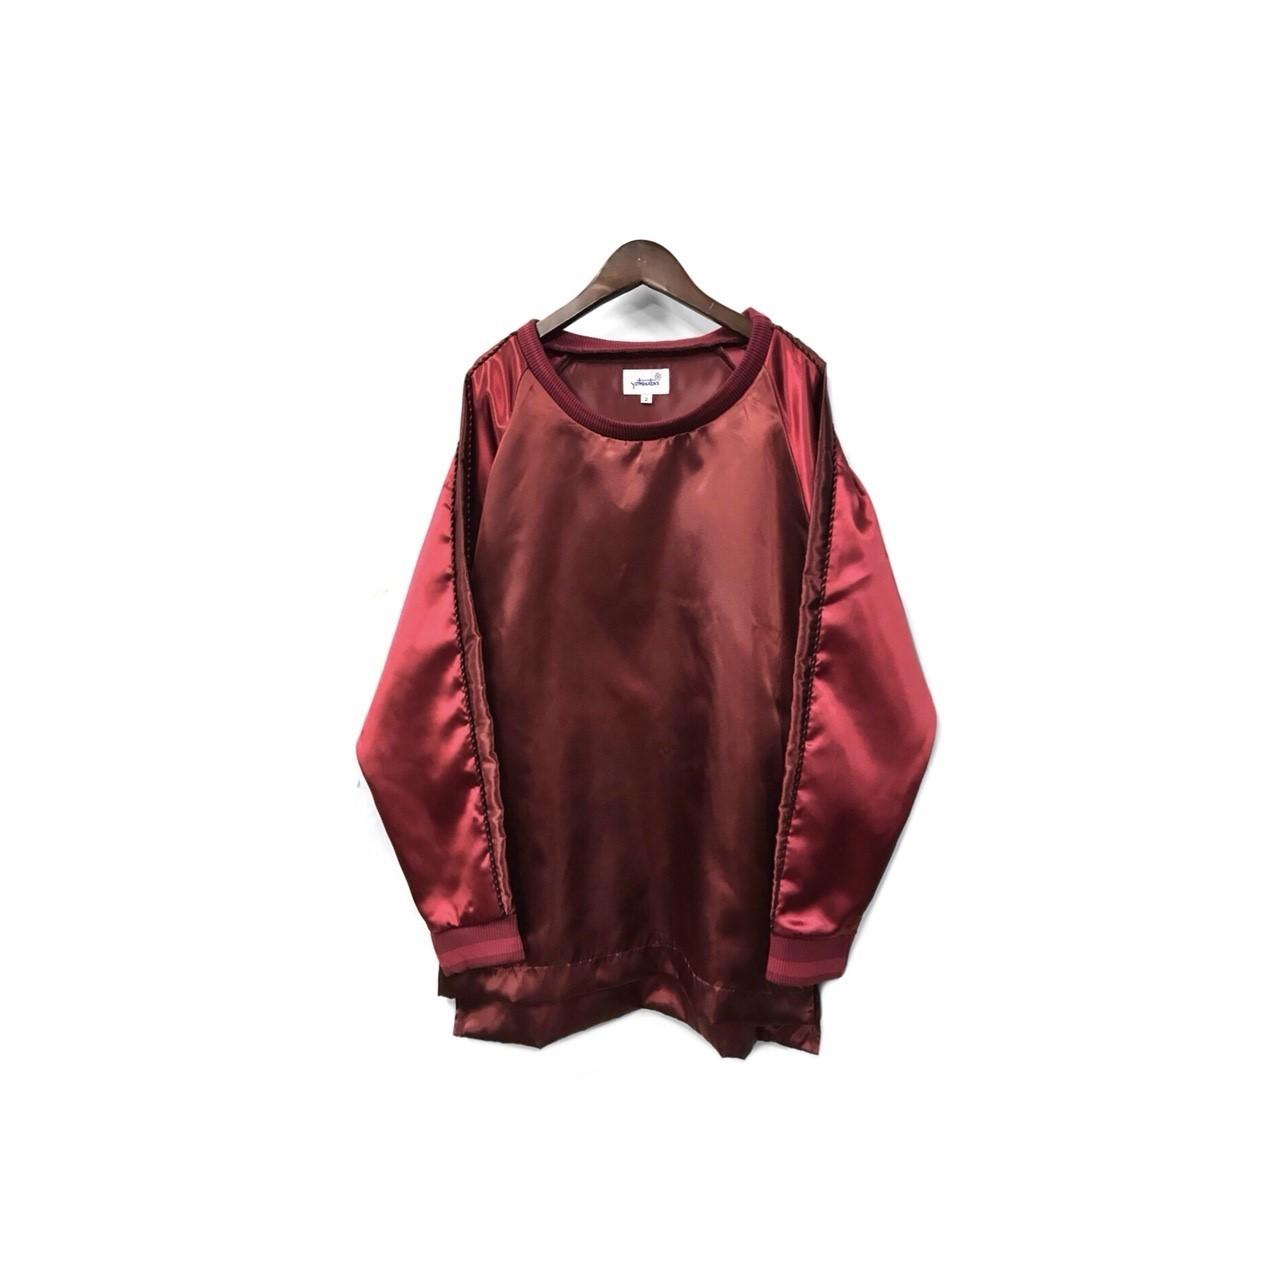 yotsuba - Souvenir Pullover Tops / Wine Red ¥18000+tax